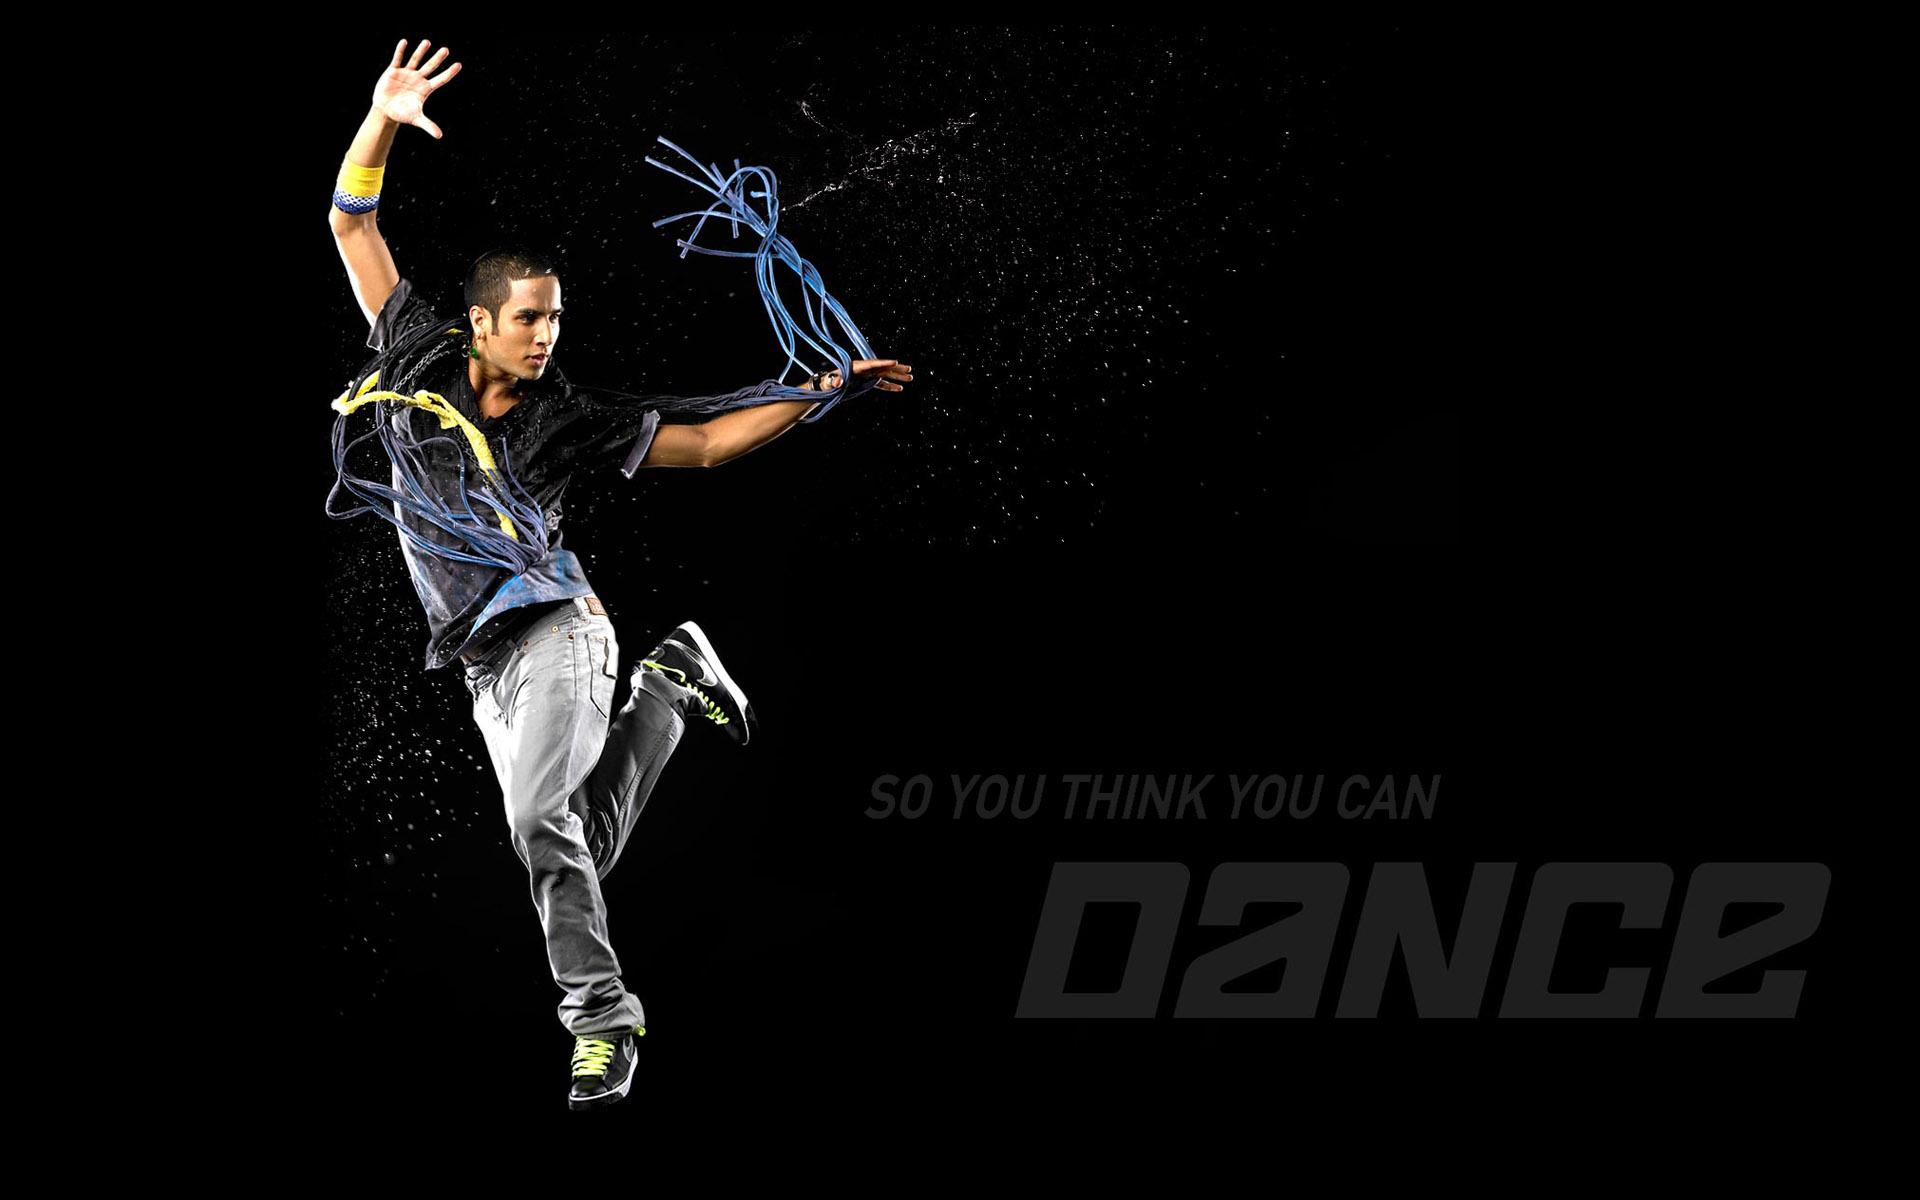 So You Think You Can Dance Man Tv Dance Dancer Dancing Male Wallpaper 1920x1200